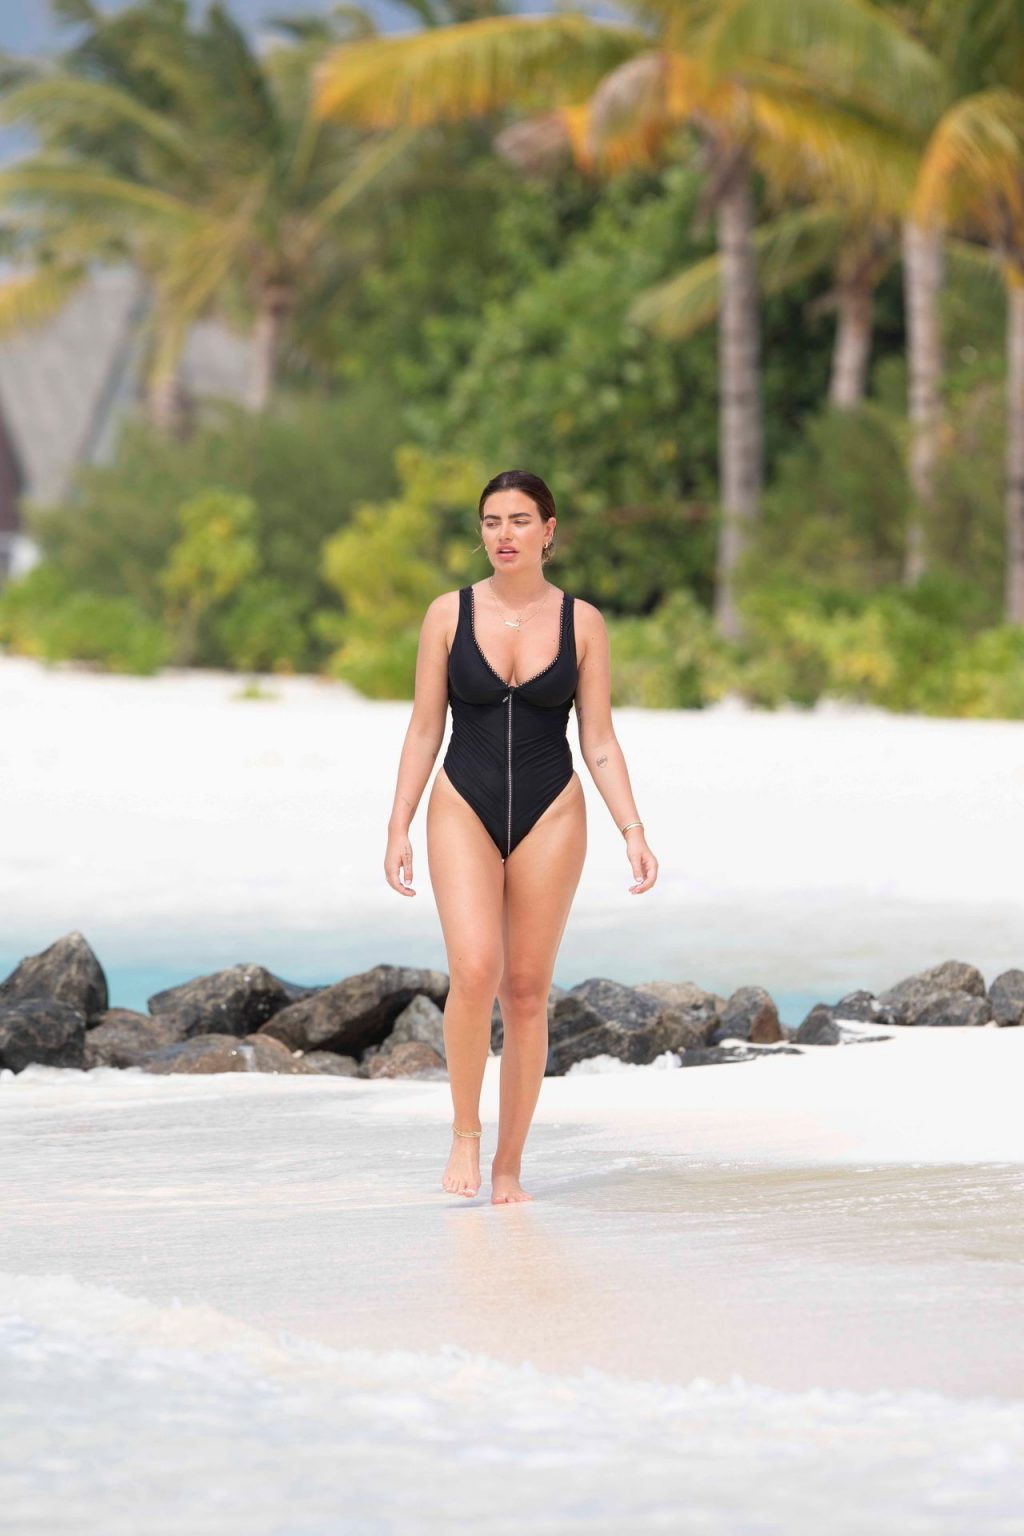 Megan Barton Hanson Sexy The Fappening Blog 4 1024x1536 - Megan Barton-Hanson Seen Enjoying Her Holiday in the Maldives (22 Photos)